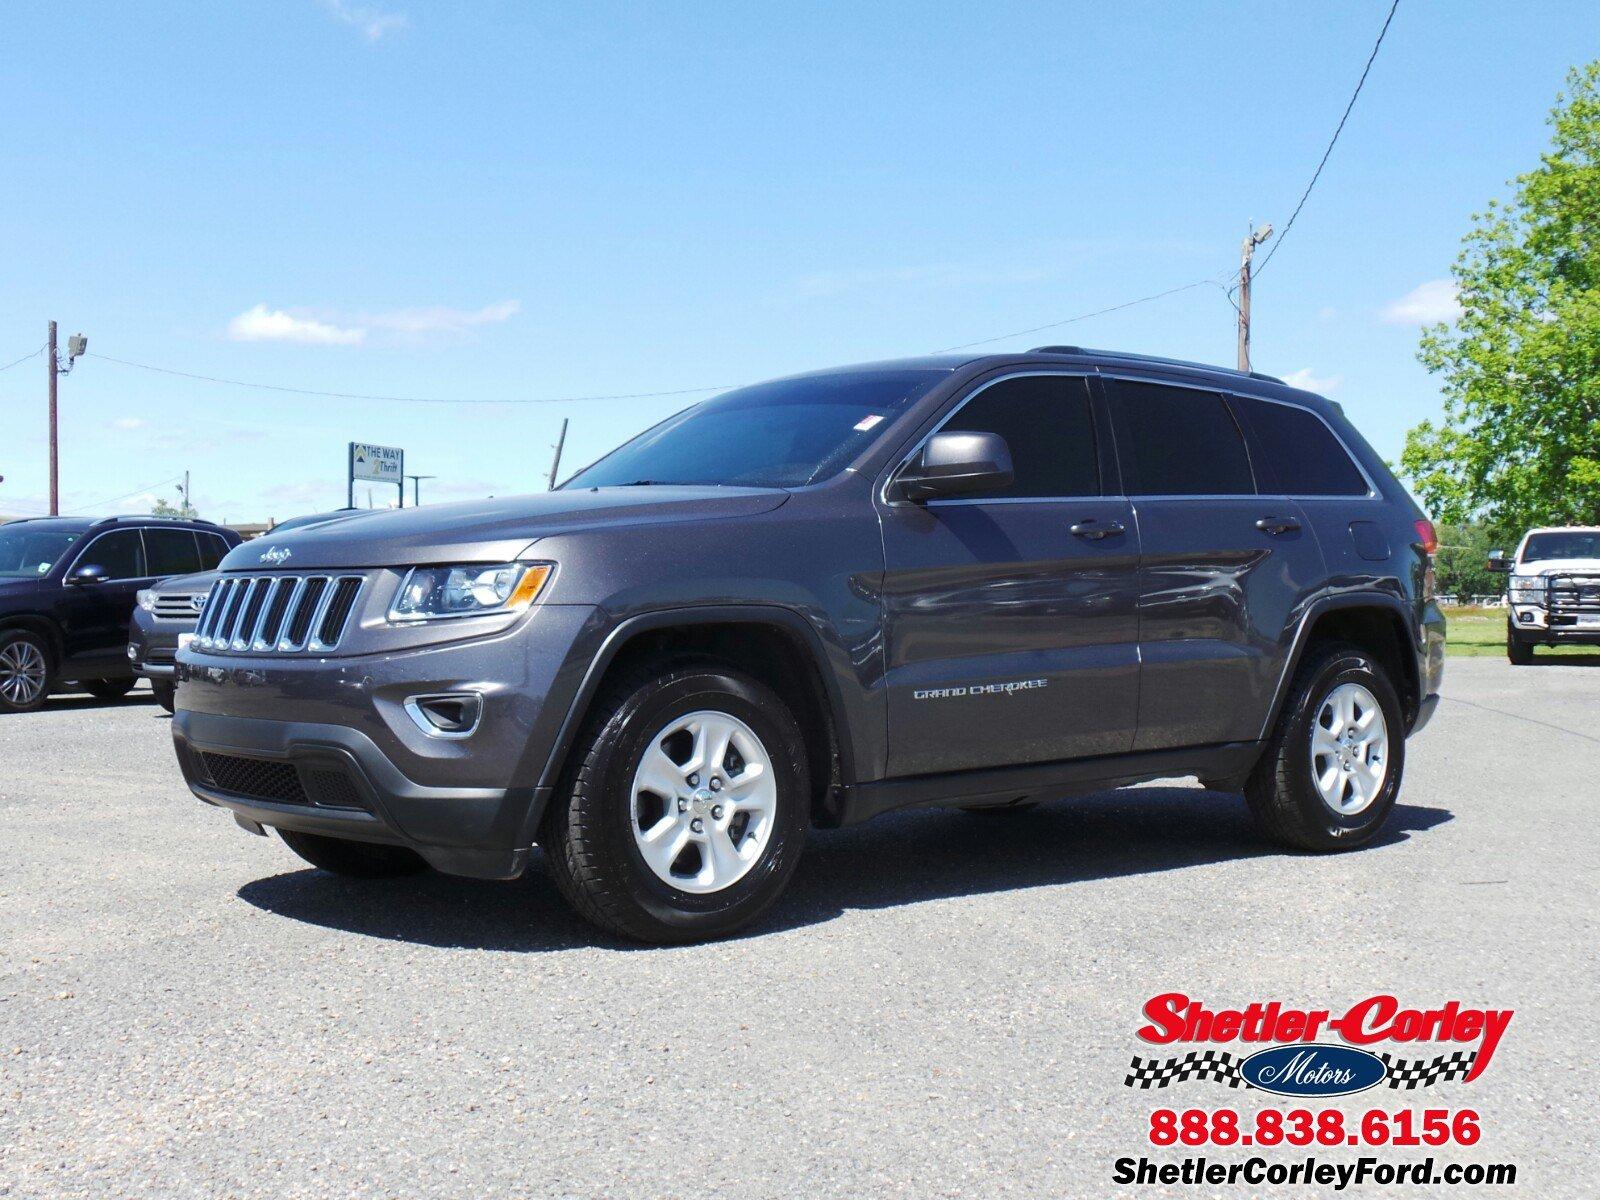 2014 Jeep Grand Cherokee RWD  Laredo SUV